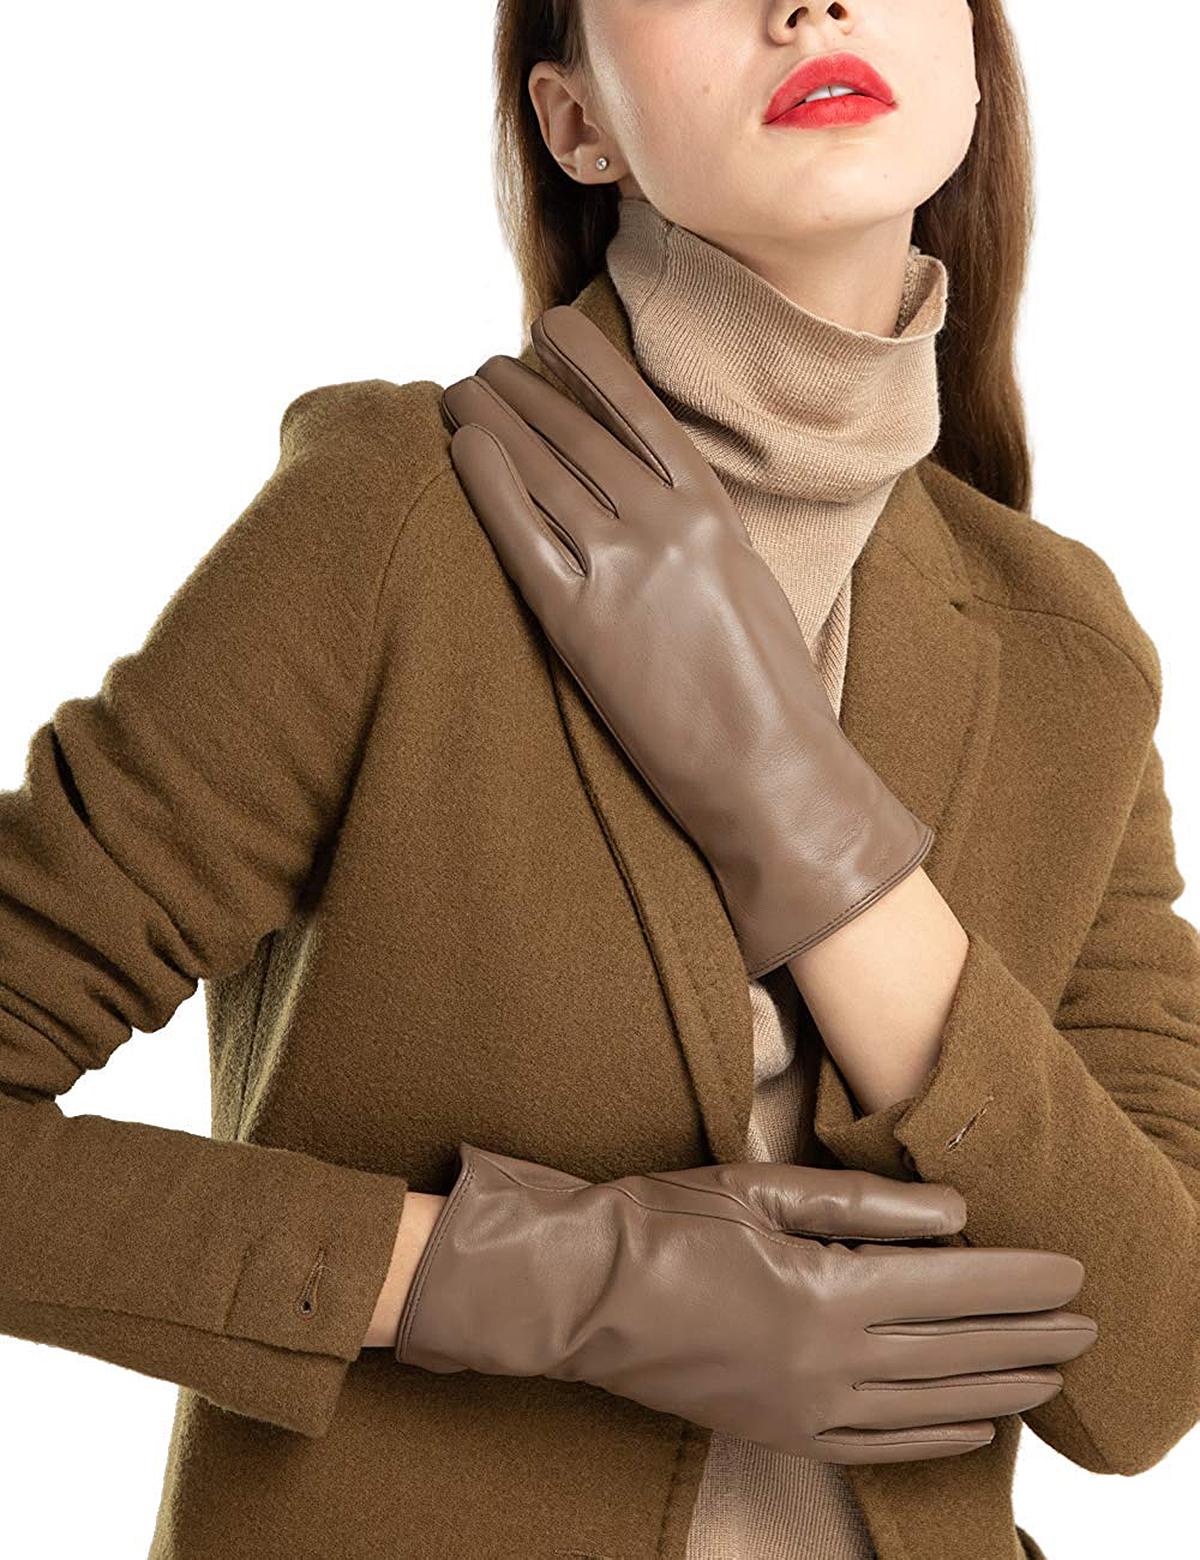 FEIQIAOSH Super-Soft Leather Winter Gloves